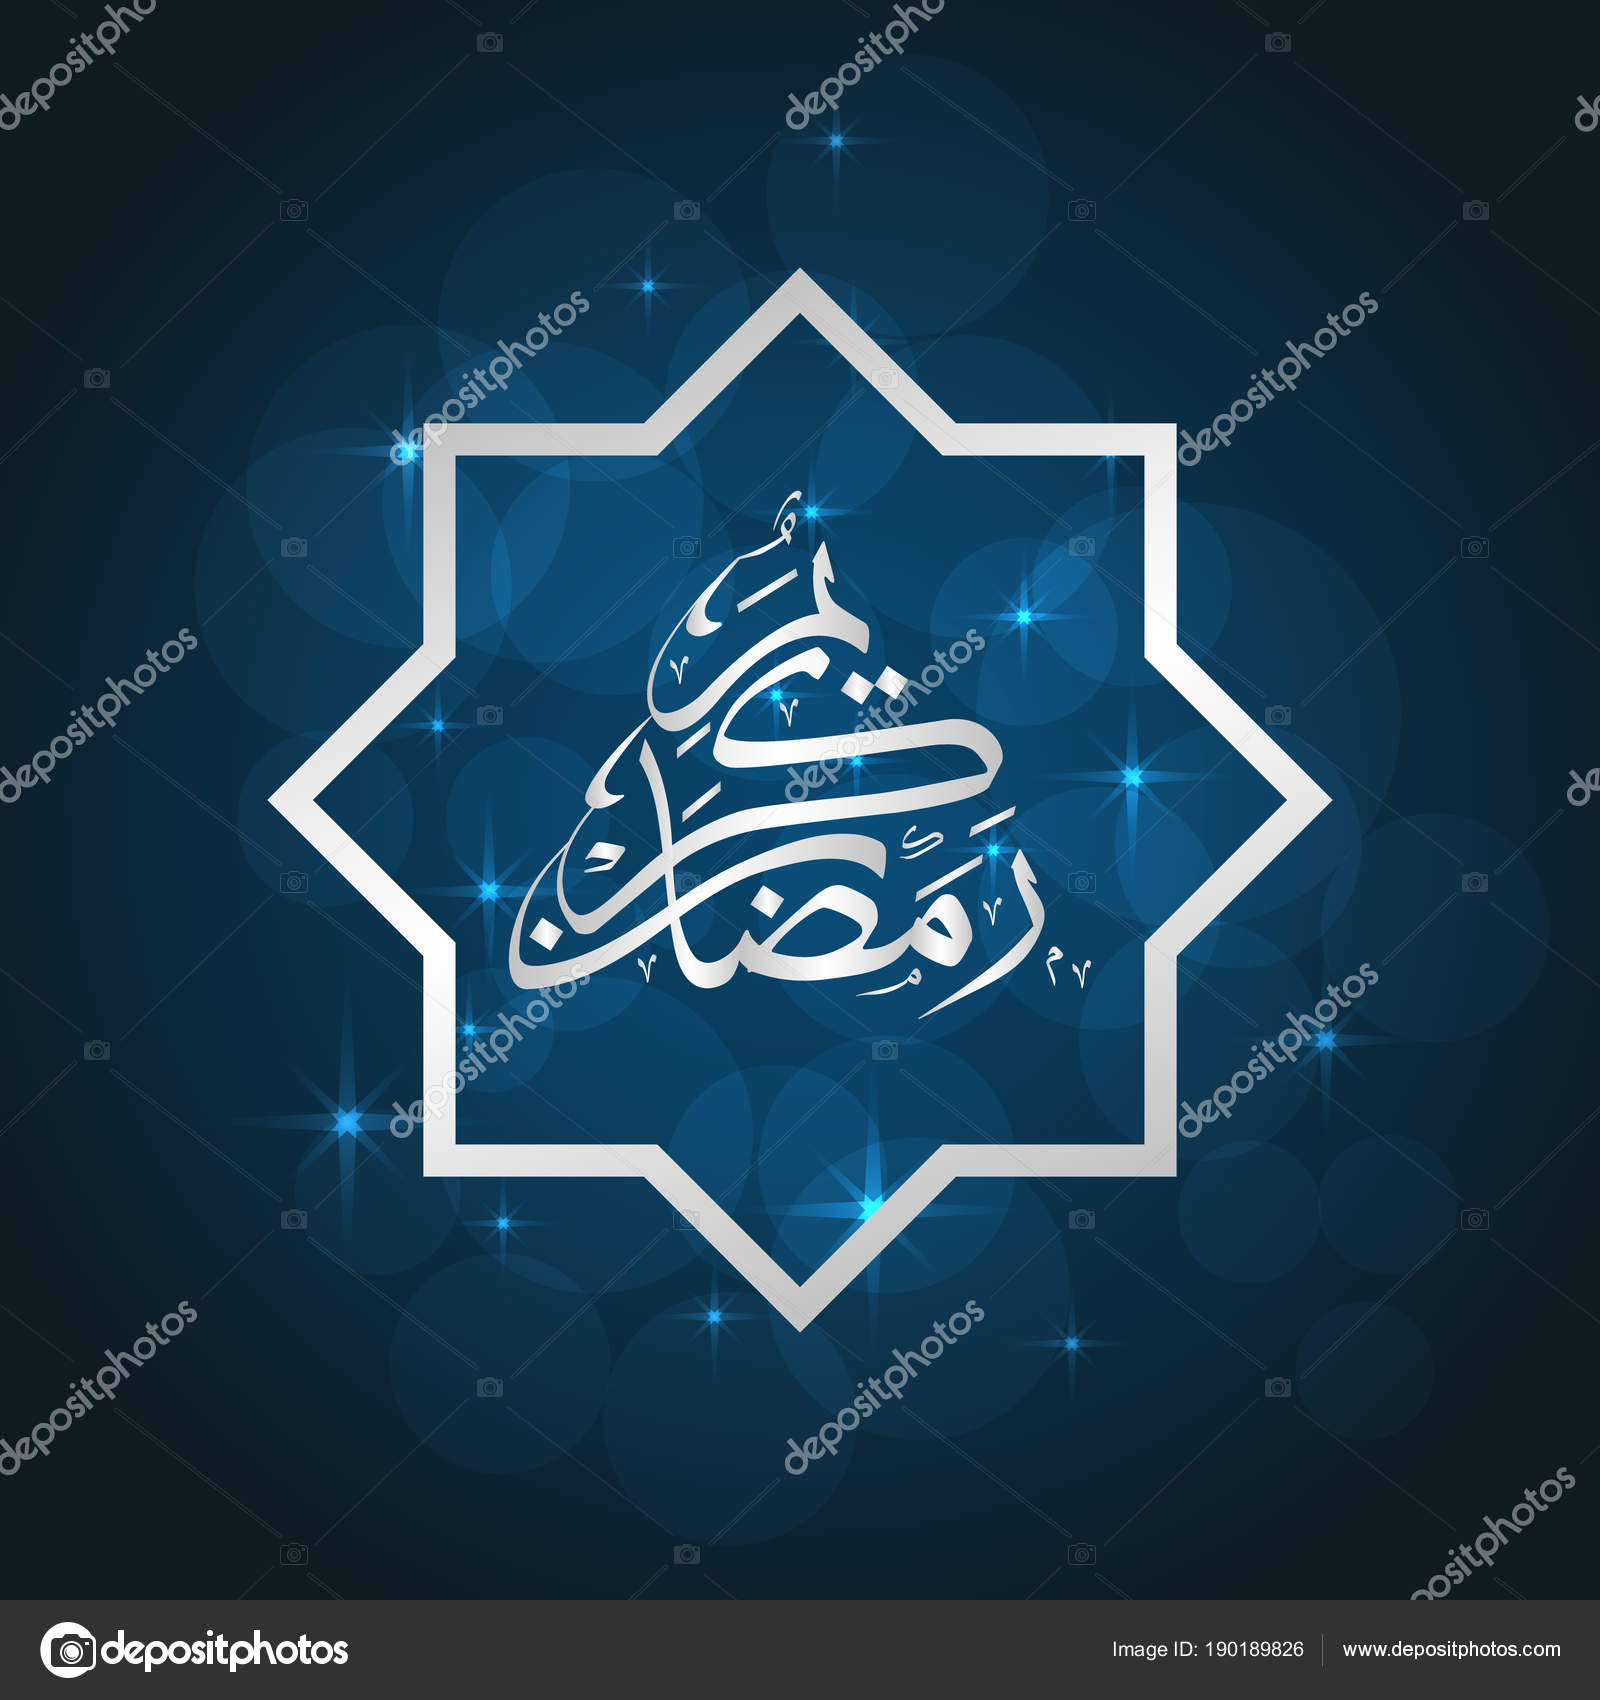 Ramadan greeting card stock vector nataly nete 190189826 ramadan greeting card stock vector m4hsunfo